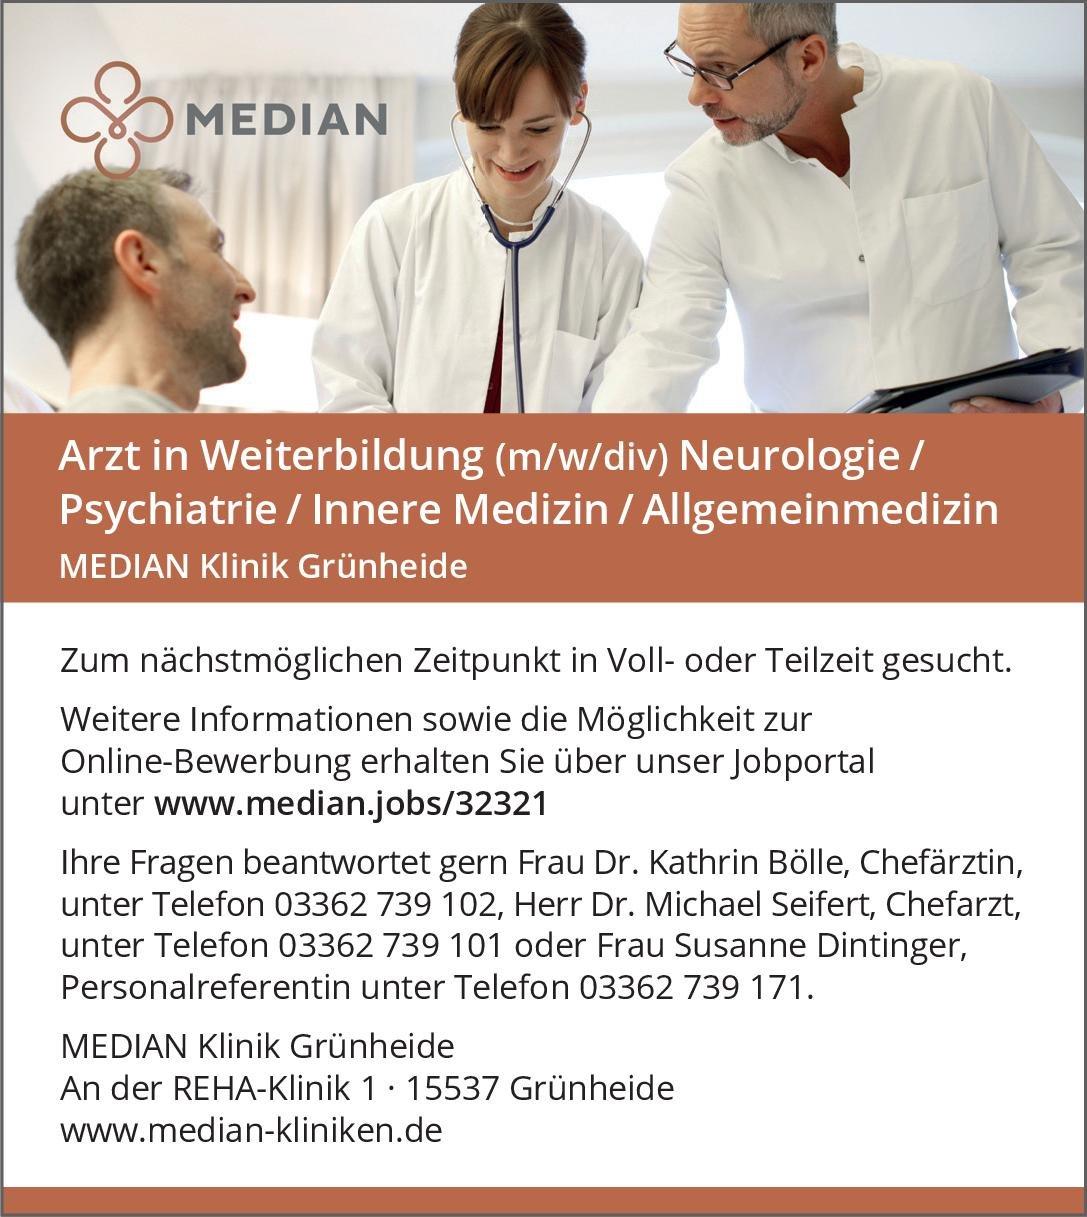 MEDIAN Klinik Grünheide Arzt in Weiterbildung (m/w/div) Neurologie /Psychiatrie / Innere Medizin / Allgemeinmedizin Allgemeinmedizin, Innere Medizin, Neurologie Assistenzarzt / Arzt in Weiterbildung